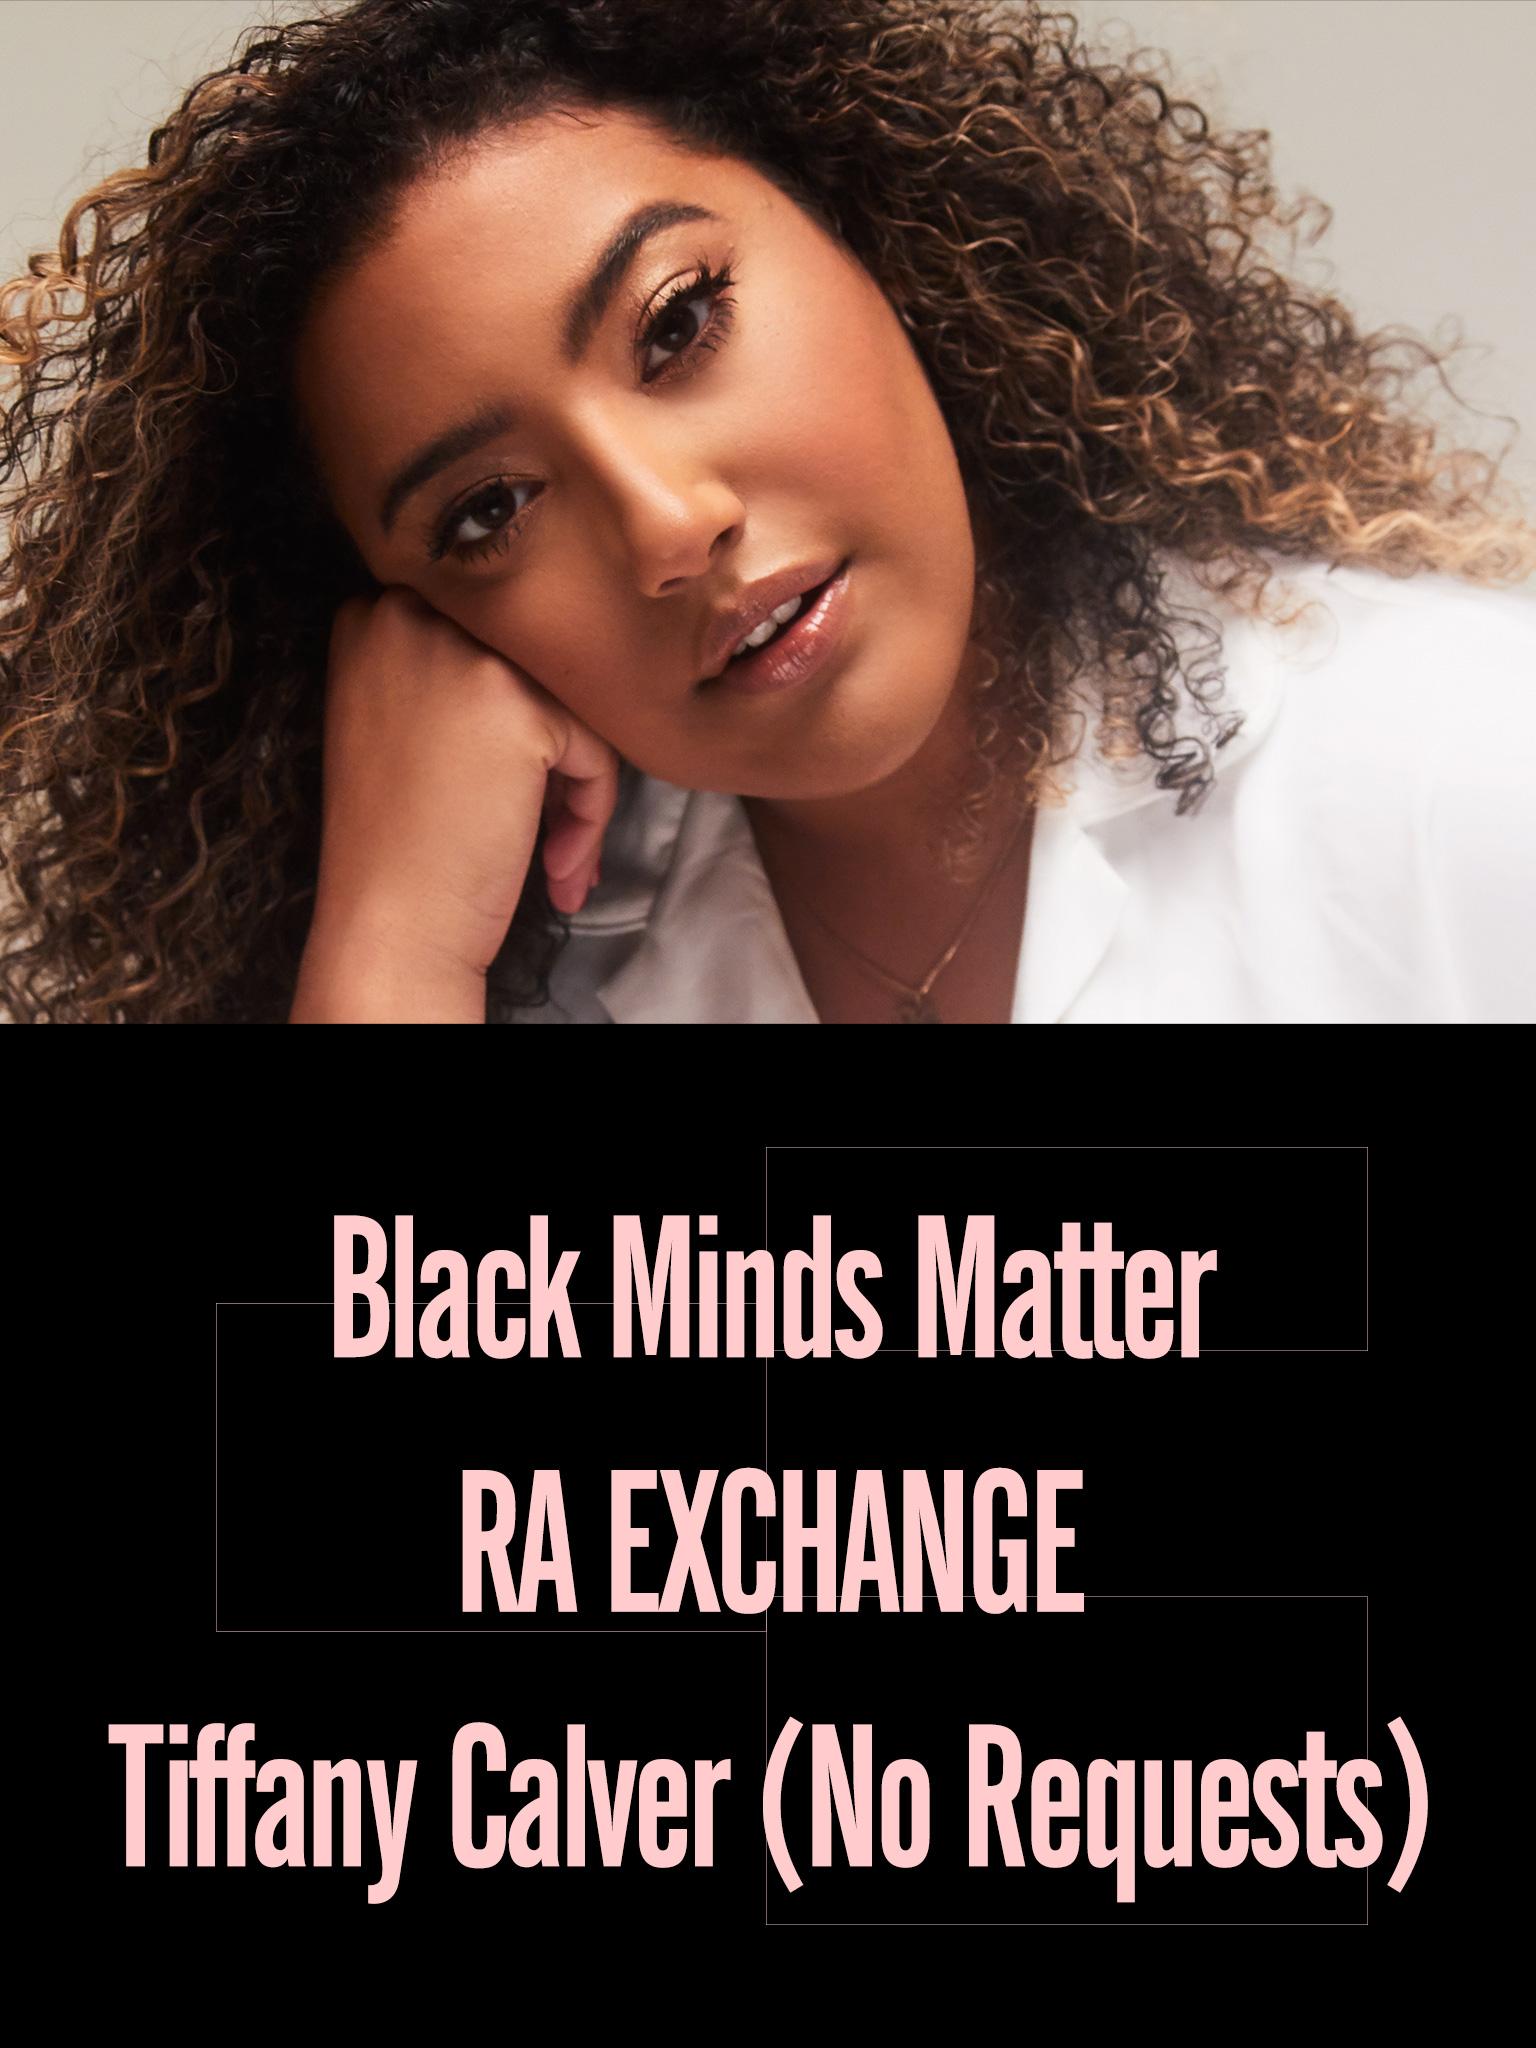 Black Minds Matter UK x RA Exchange: Tiffany Calver (No Requests)